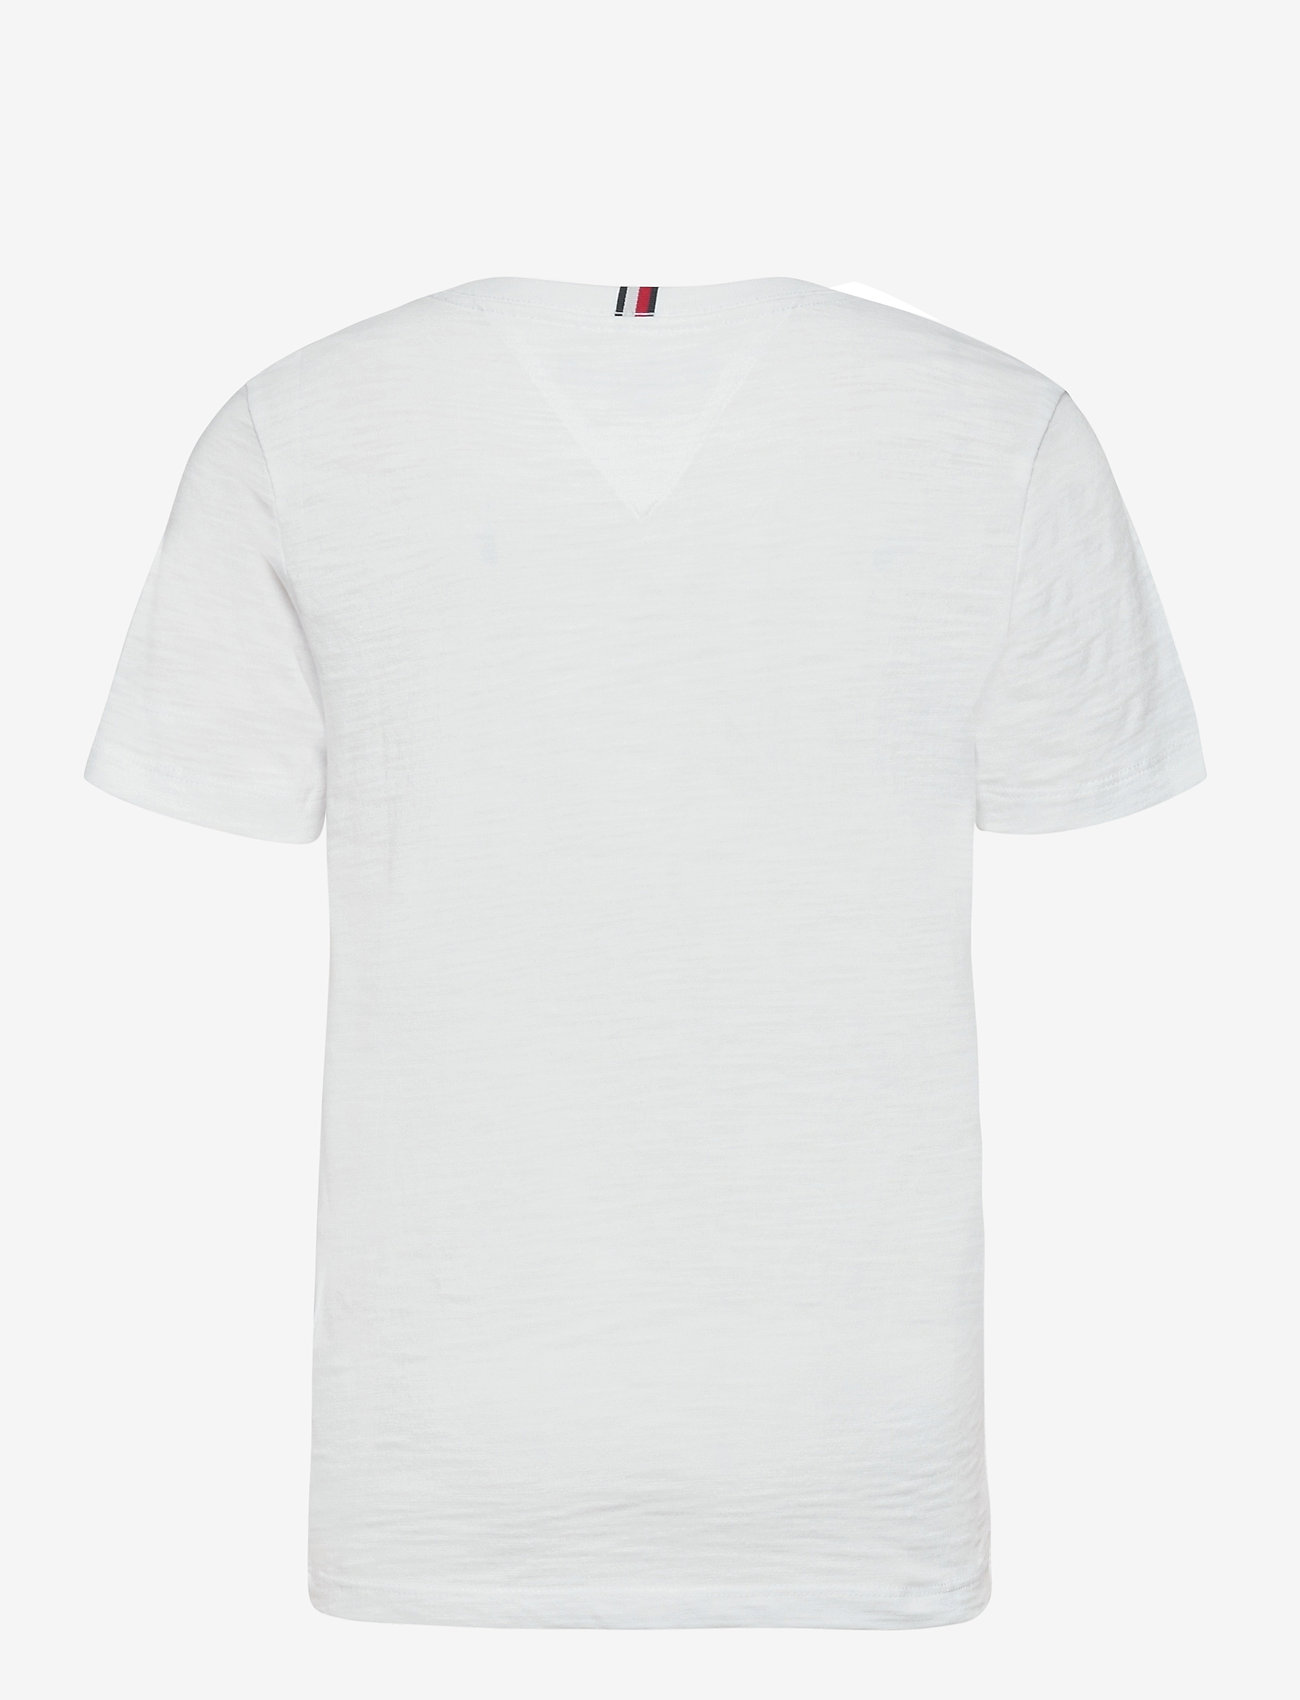 Tommy Hilfiger - UV PRINT PALM LOGO TEE S/S - short-sleeved - white - 1